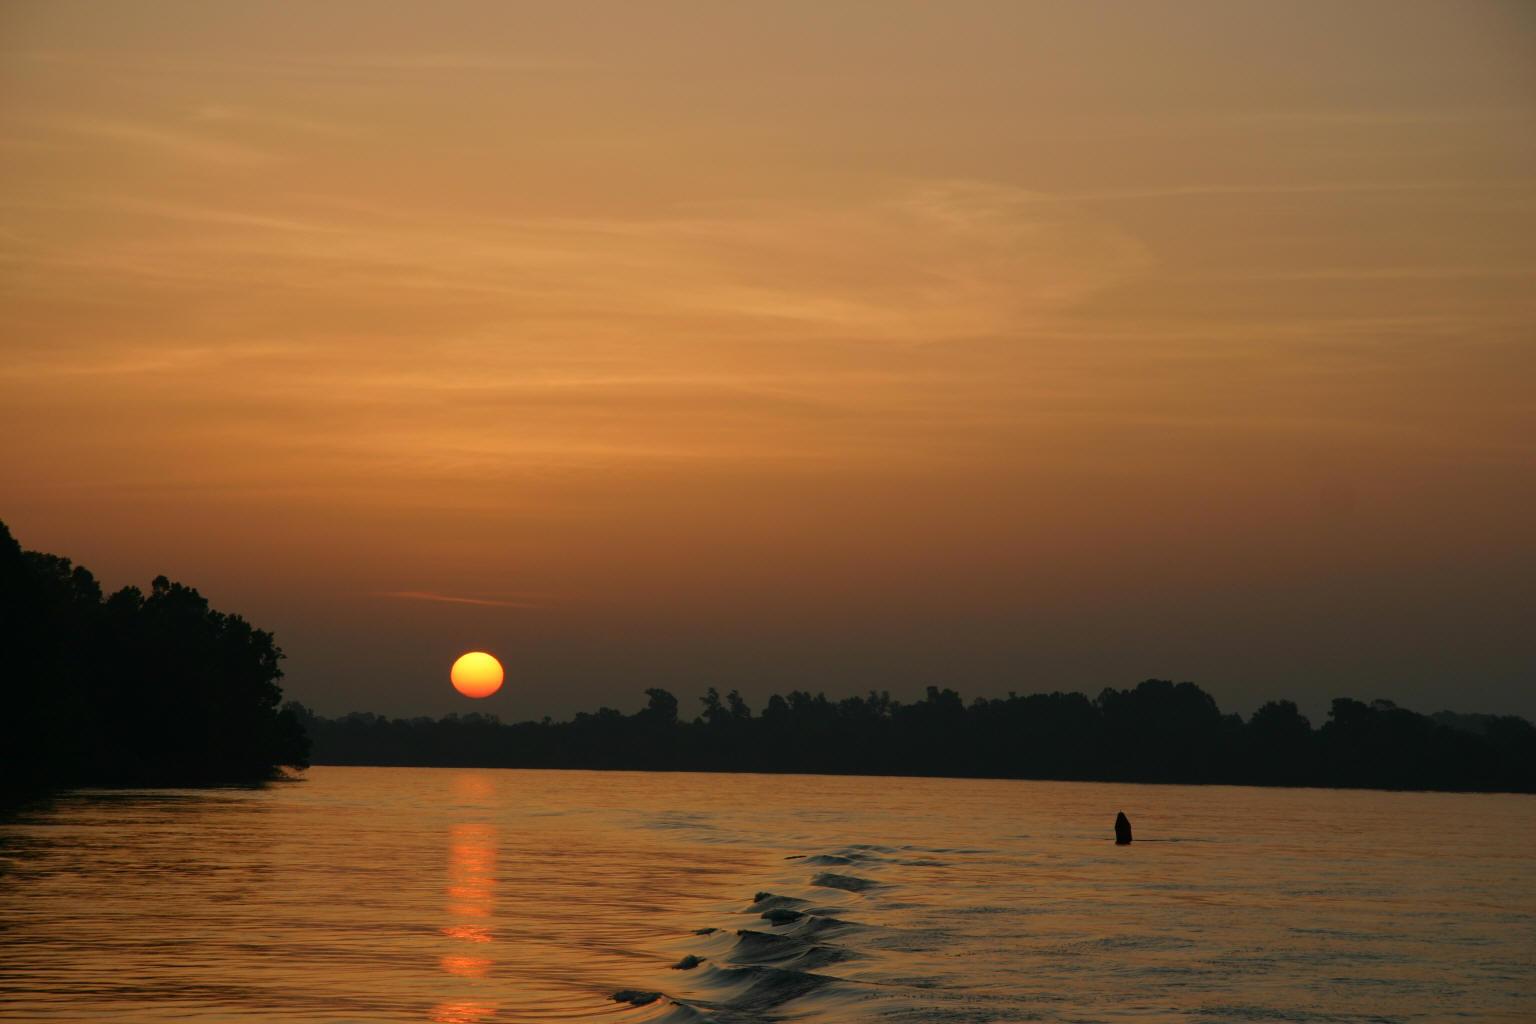 Sunrise over Pine Bluff, AR